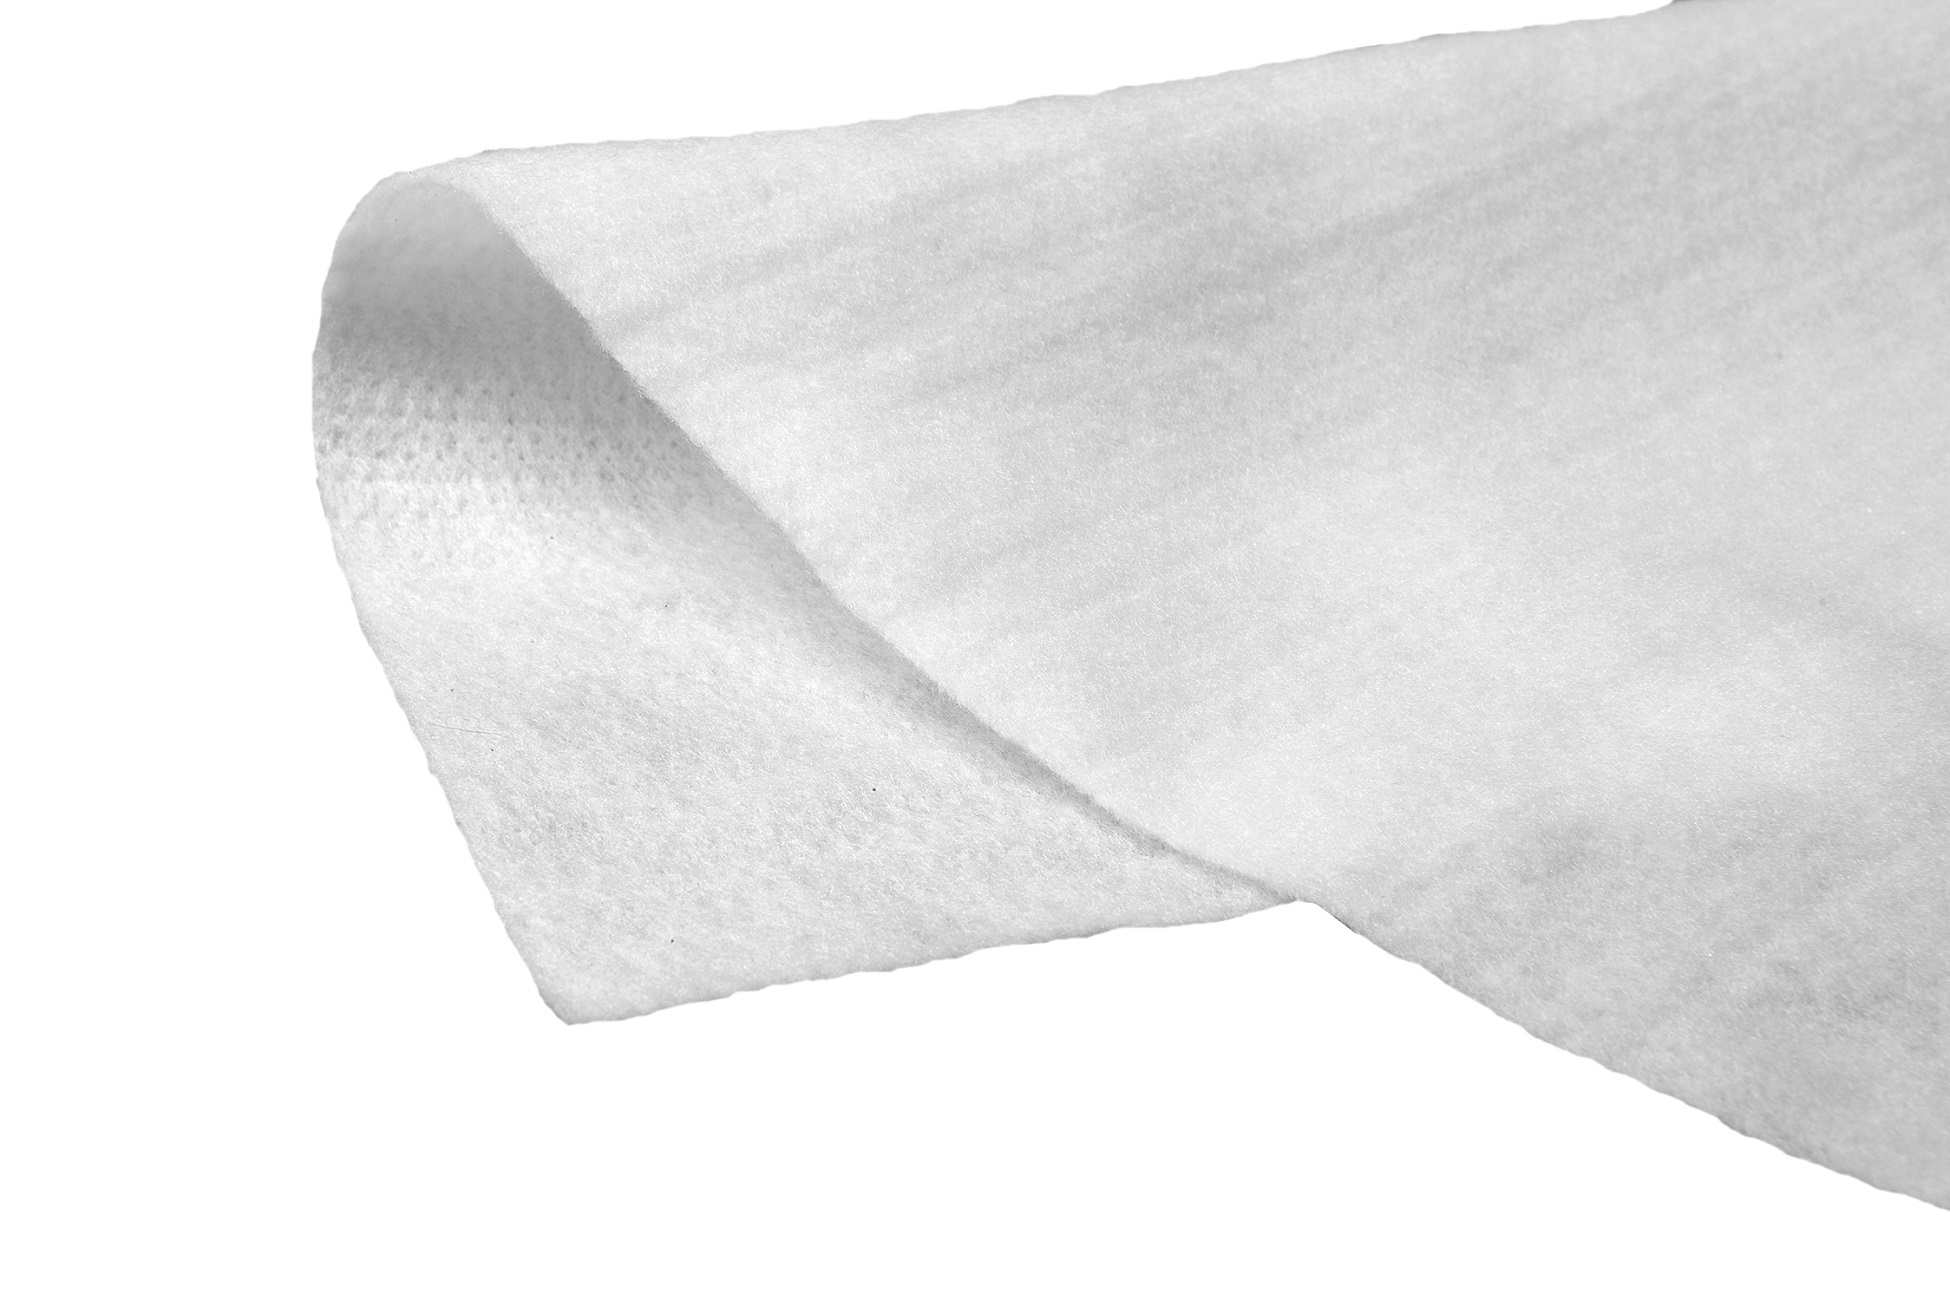 KOMA TF01 - Tukový filtr do digestoře - 60 cm x 50 cm